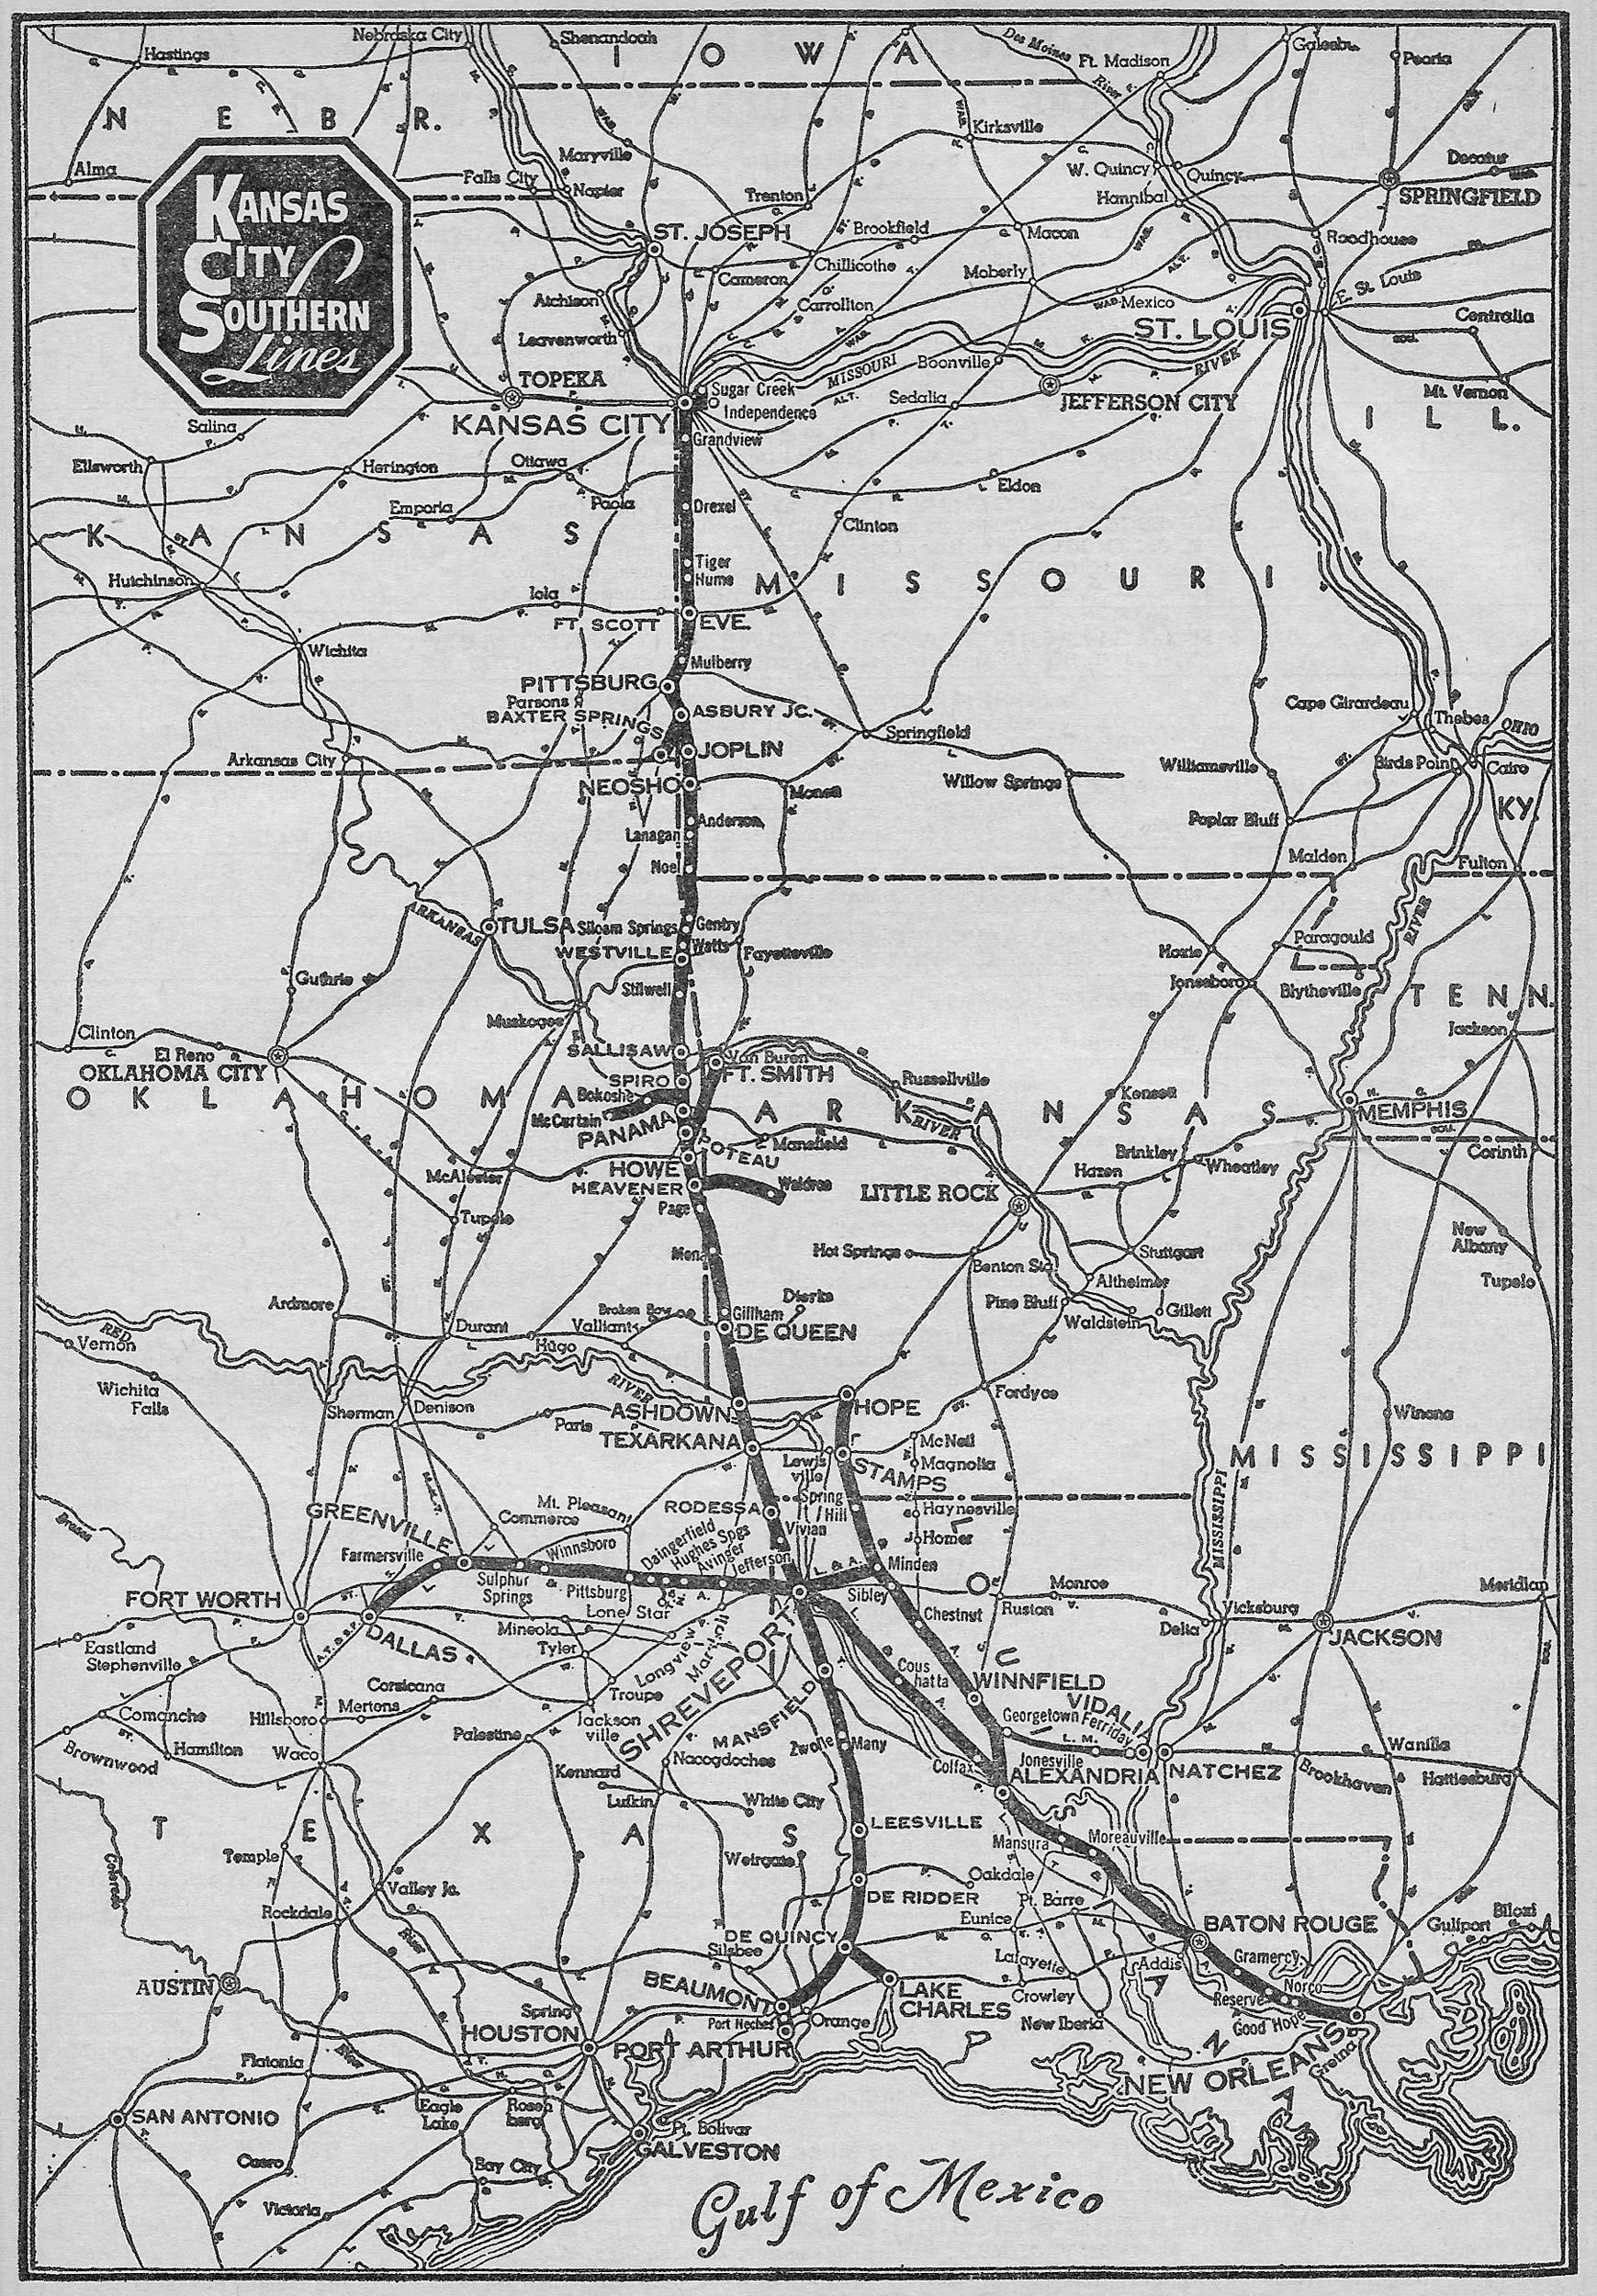 The Kansas City Southern Railway - 1889 us railroad map